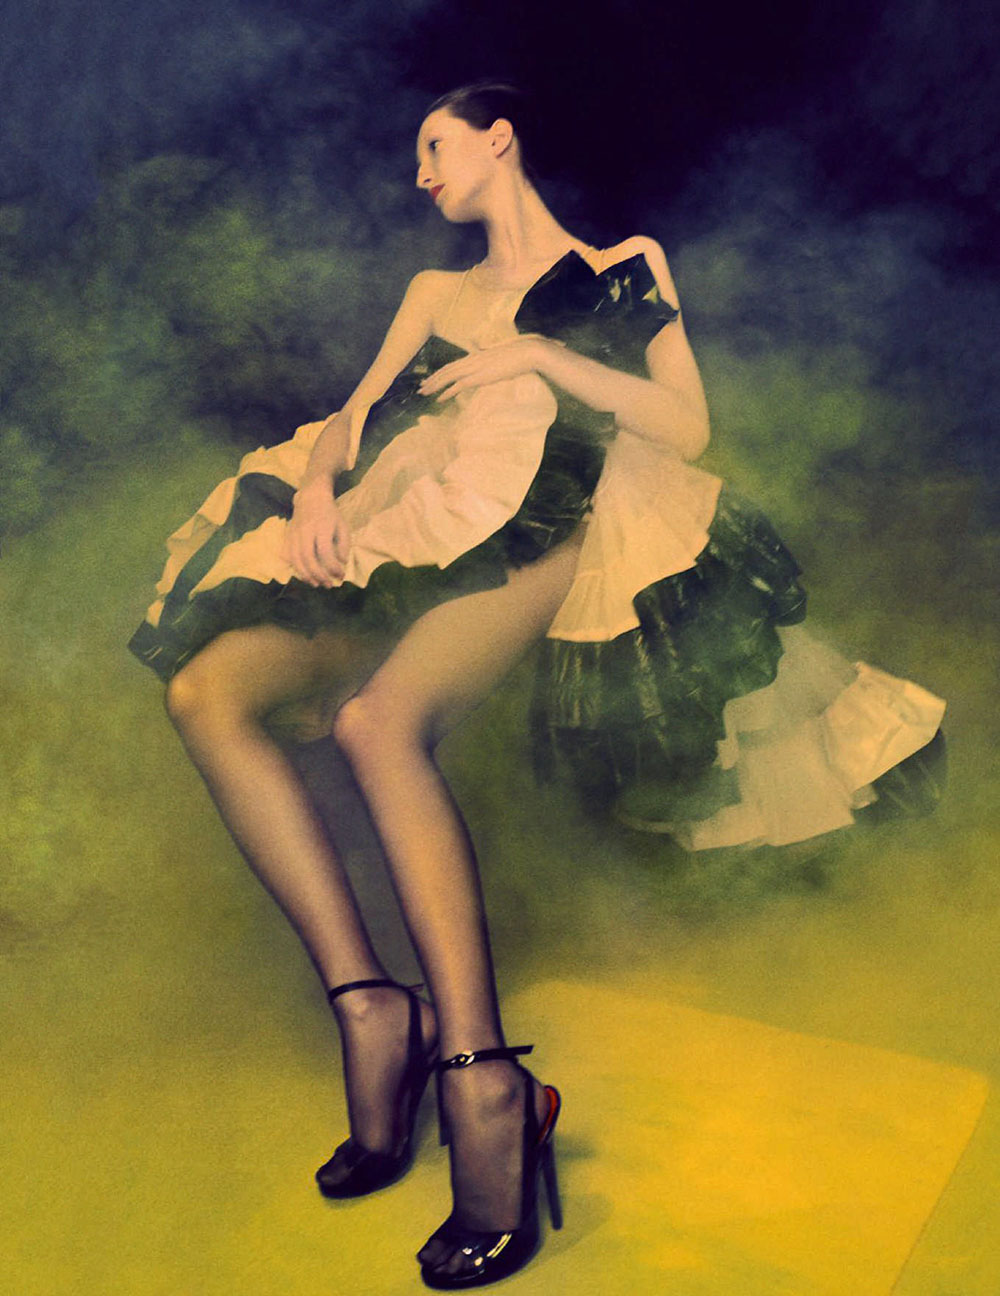 Grace Sharp by Elizaveta Porodina for Vogue Germany November 2020